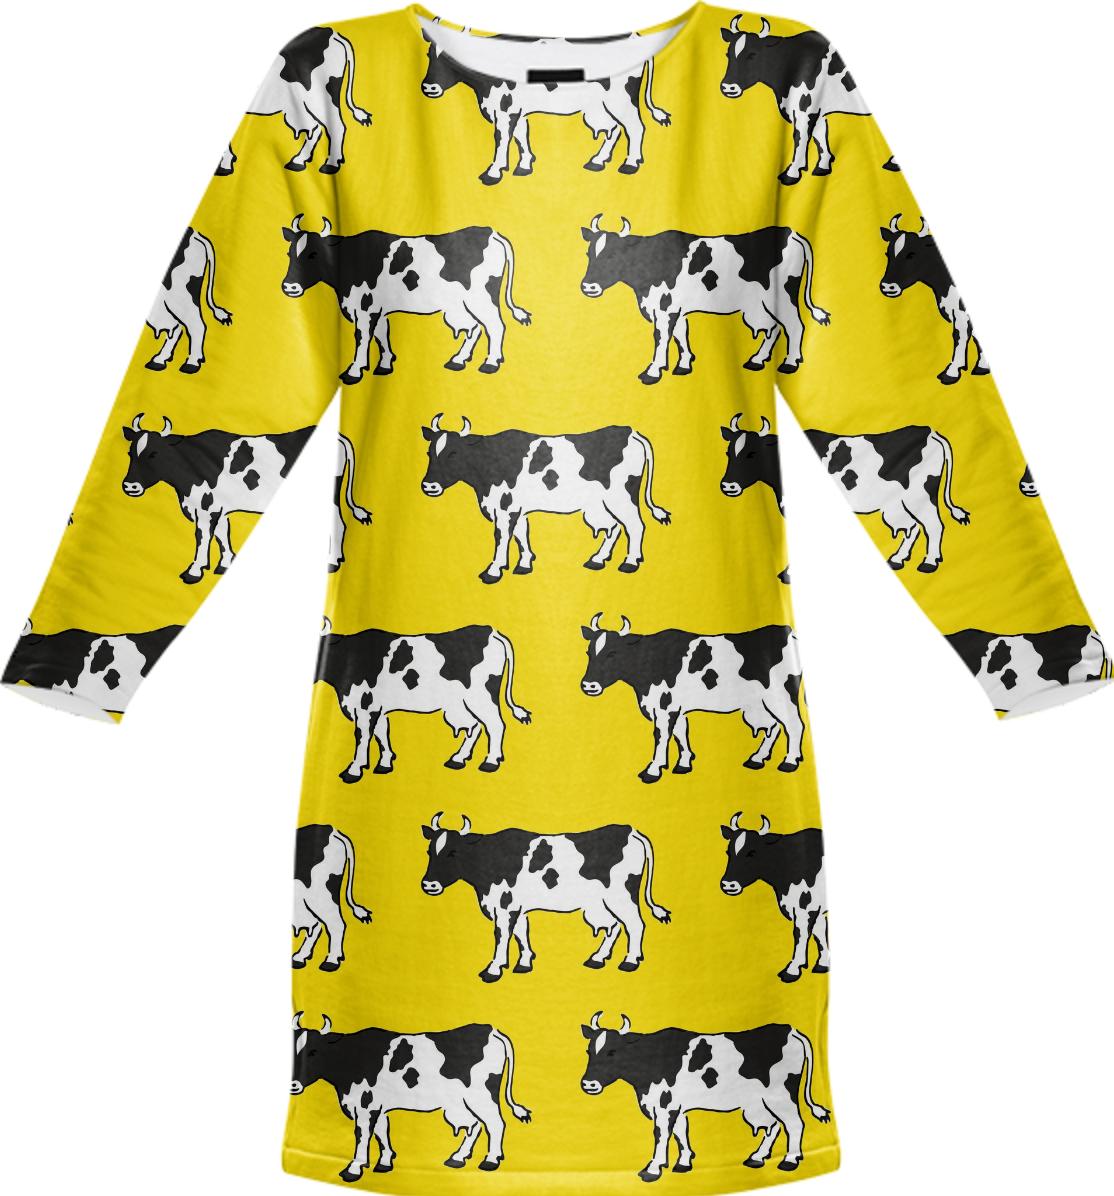 Dukepope: Shop Holy Cow! Sweatshirt Dress By Dukepope